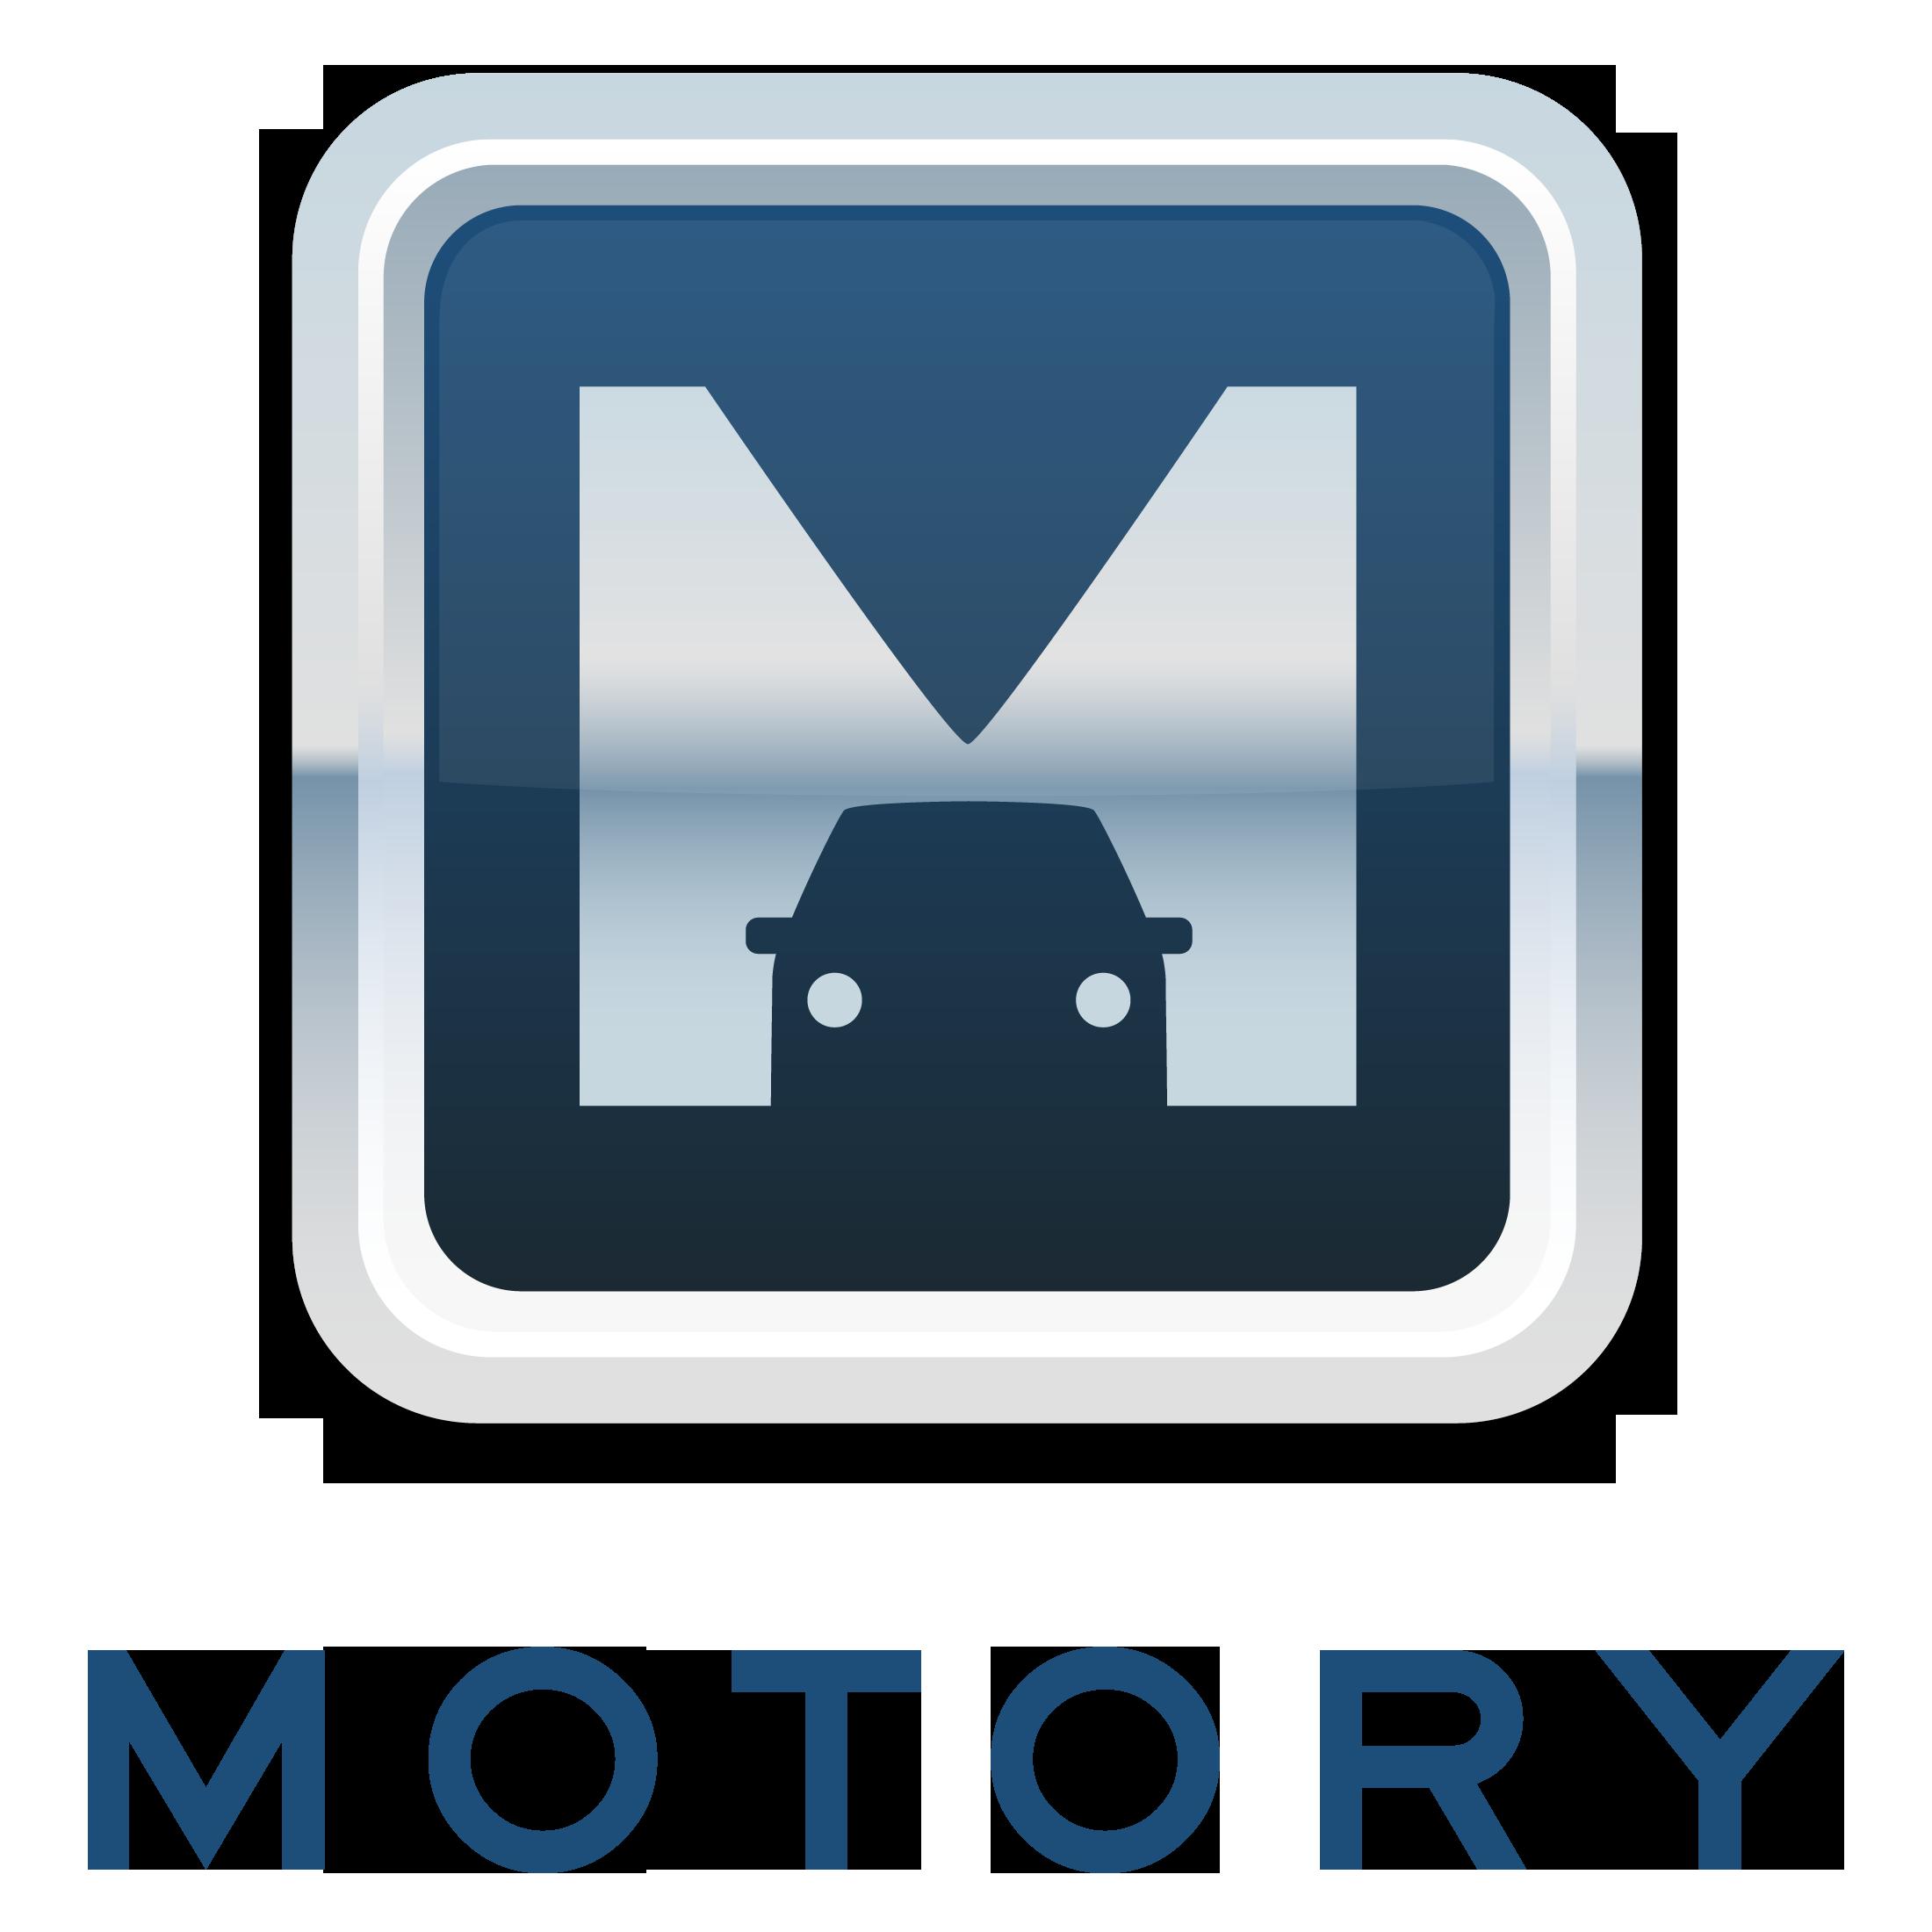 motory-logo-groß